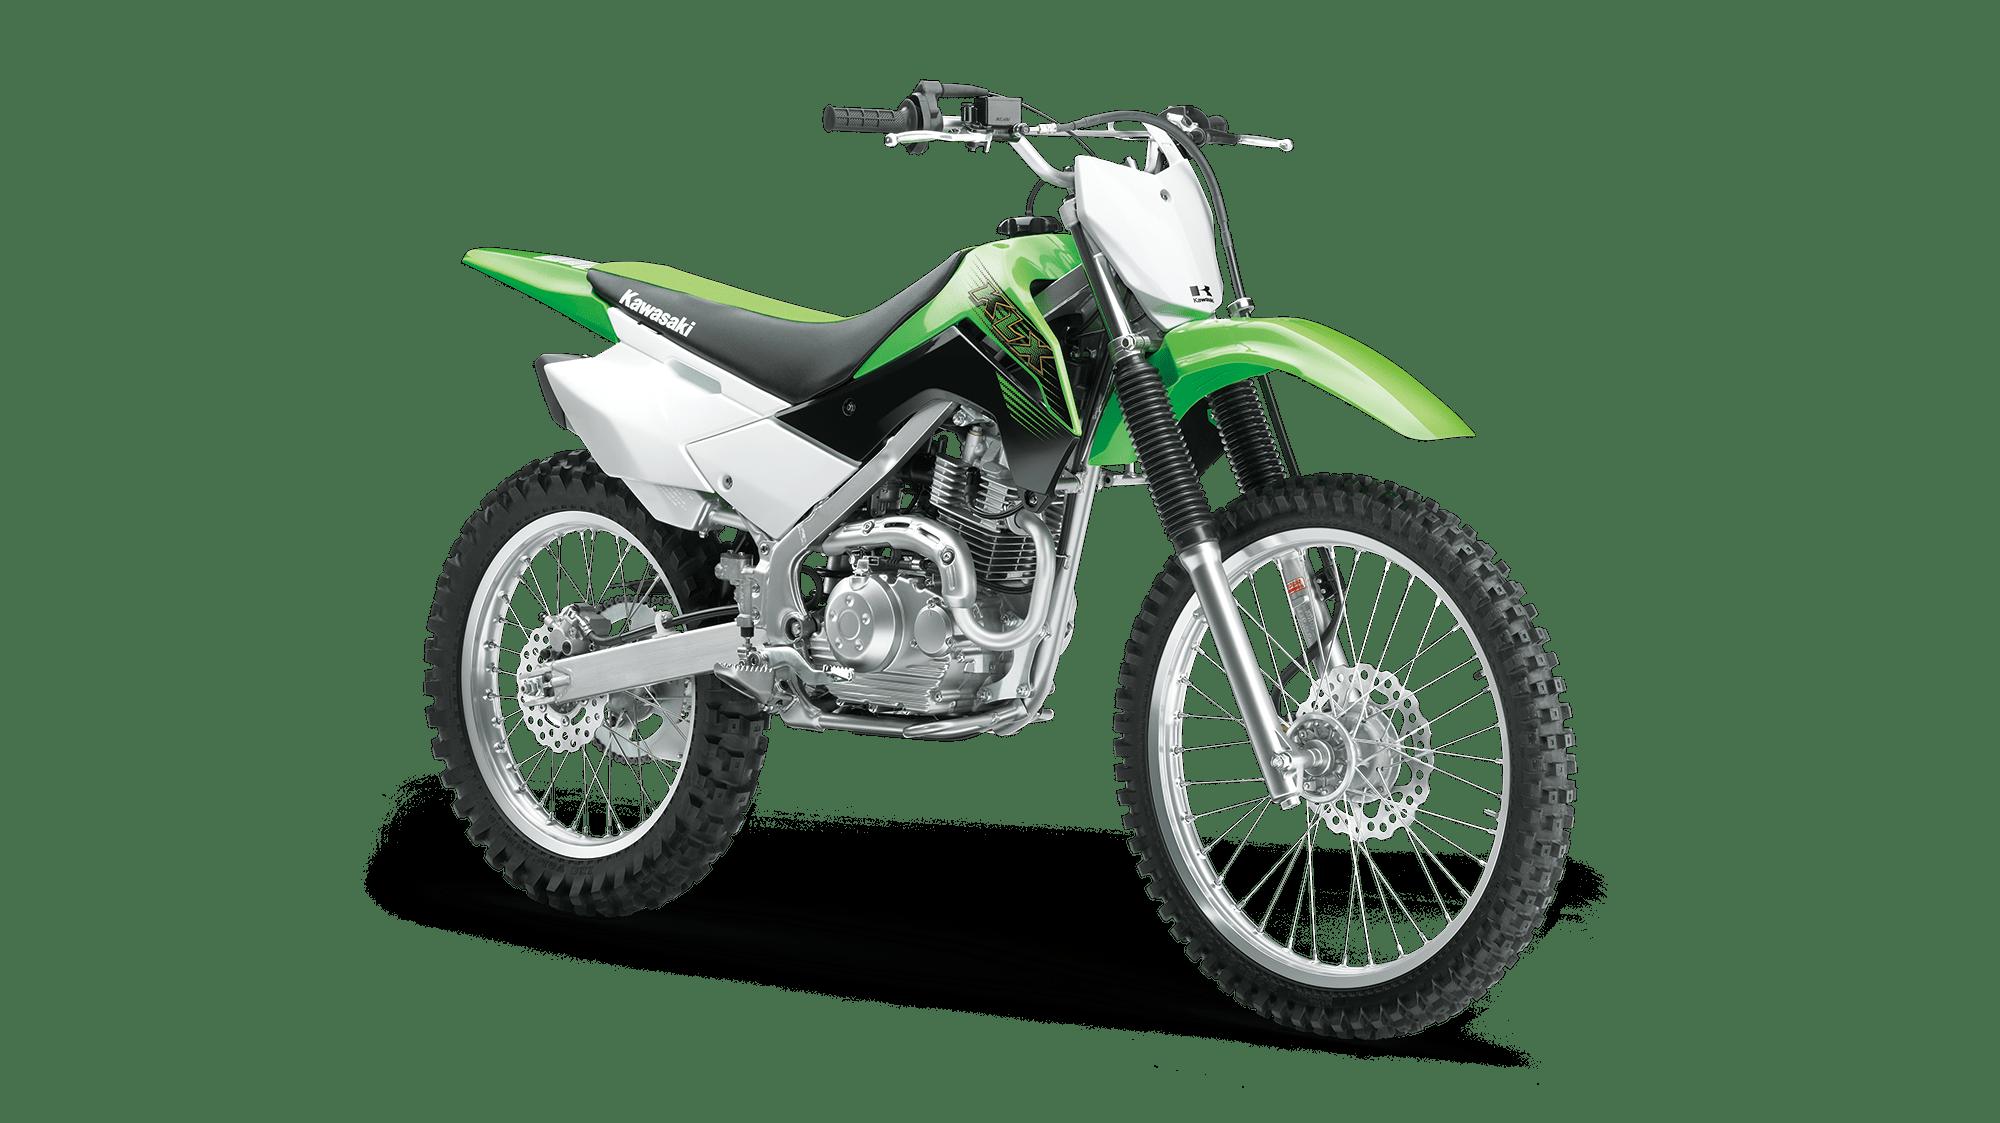 2020 KLX®140G KLR™/KLX® Motorcycle by Kawasaki